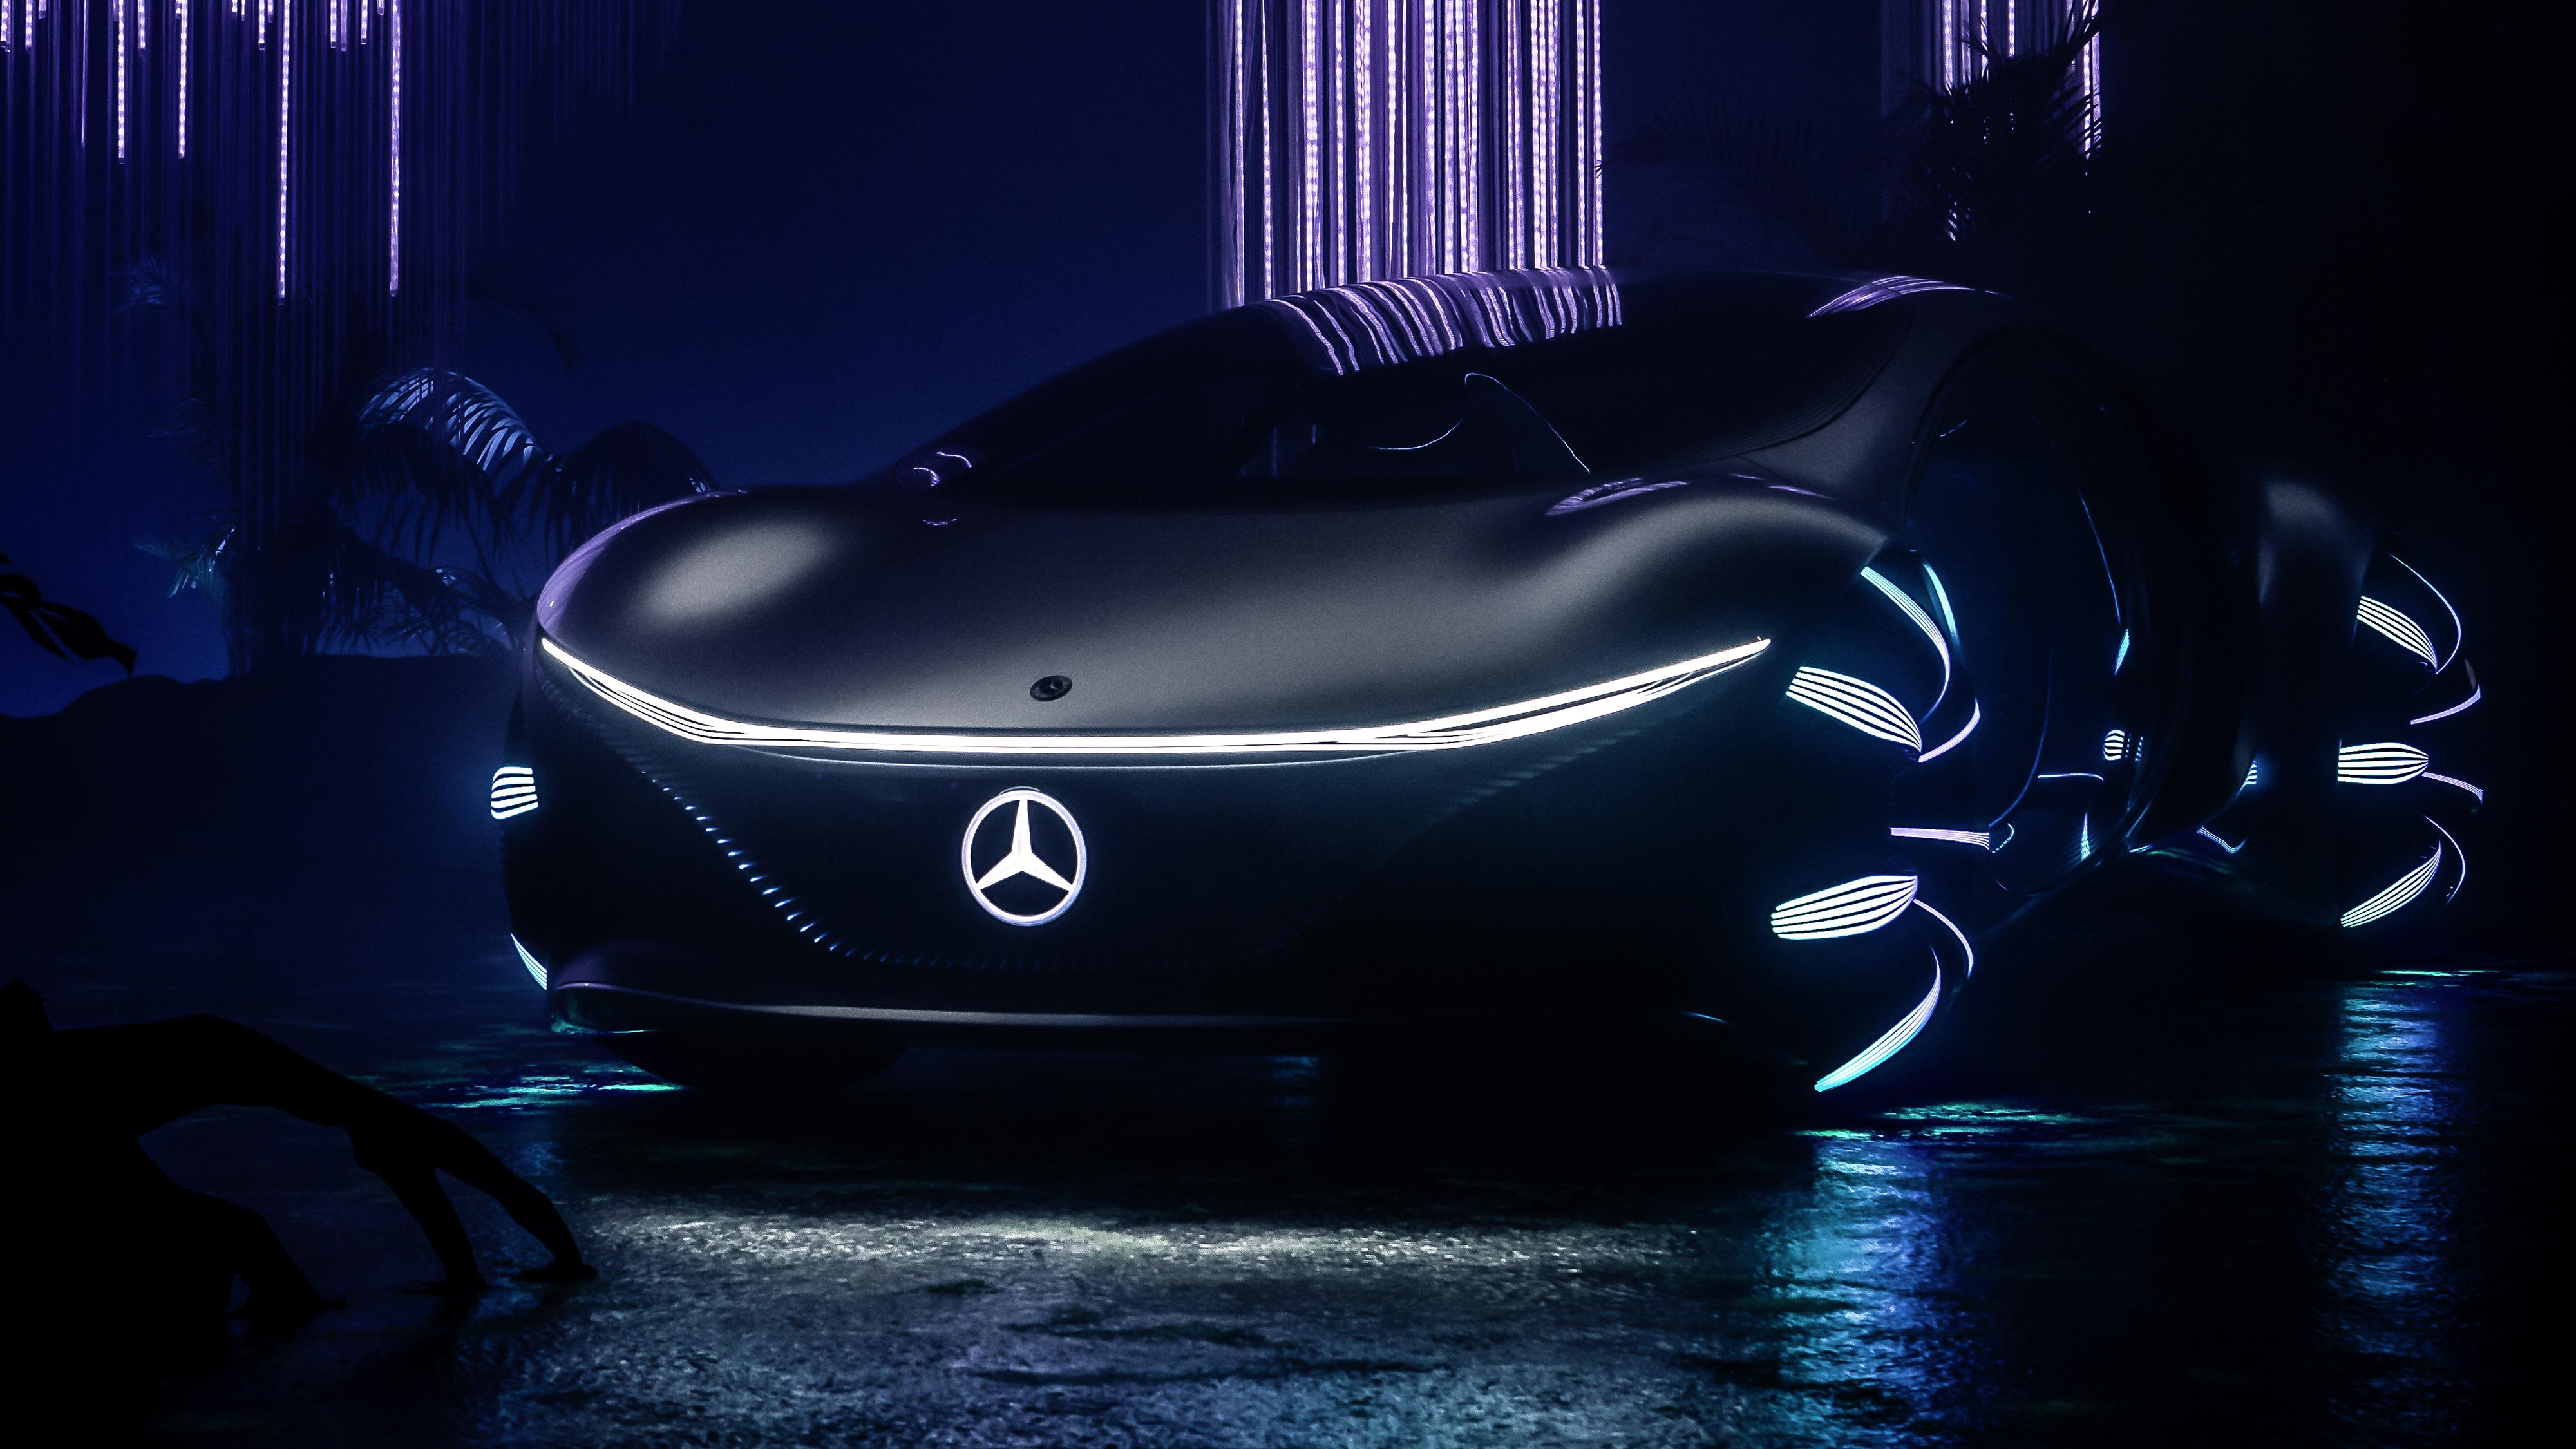 Mercedes Benz VISION AVTR 2020 4K Wallpaper HD Car Wallpapers 4000x2250